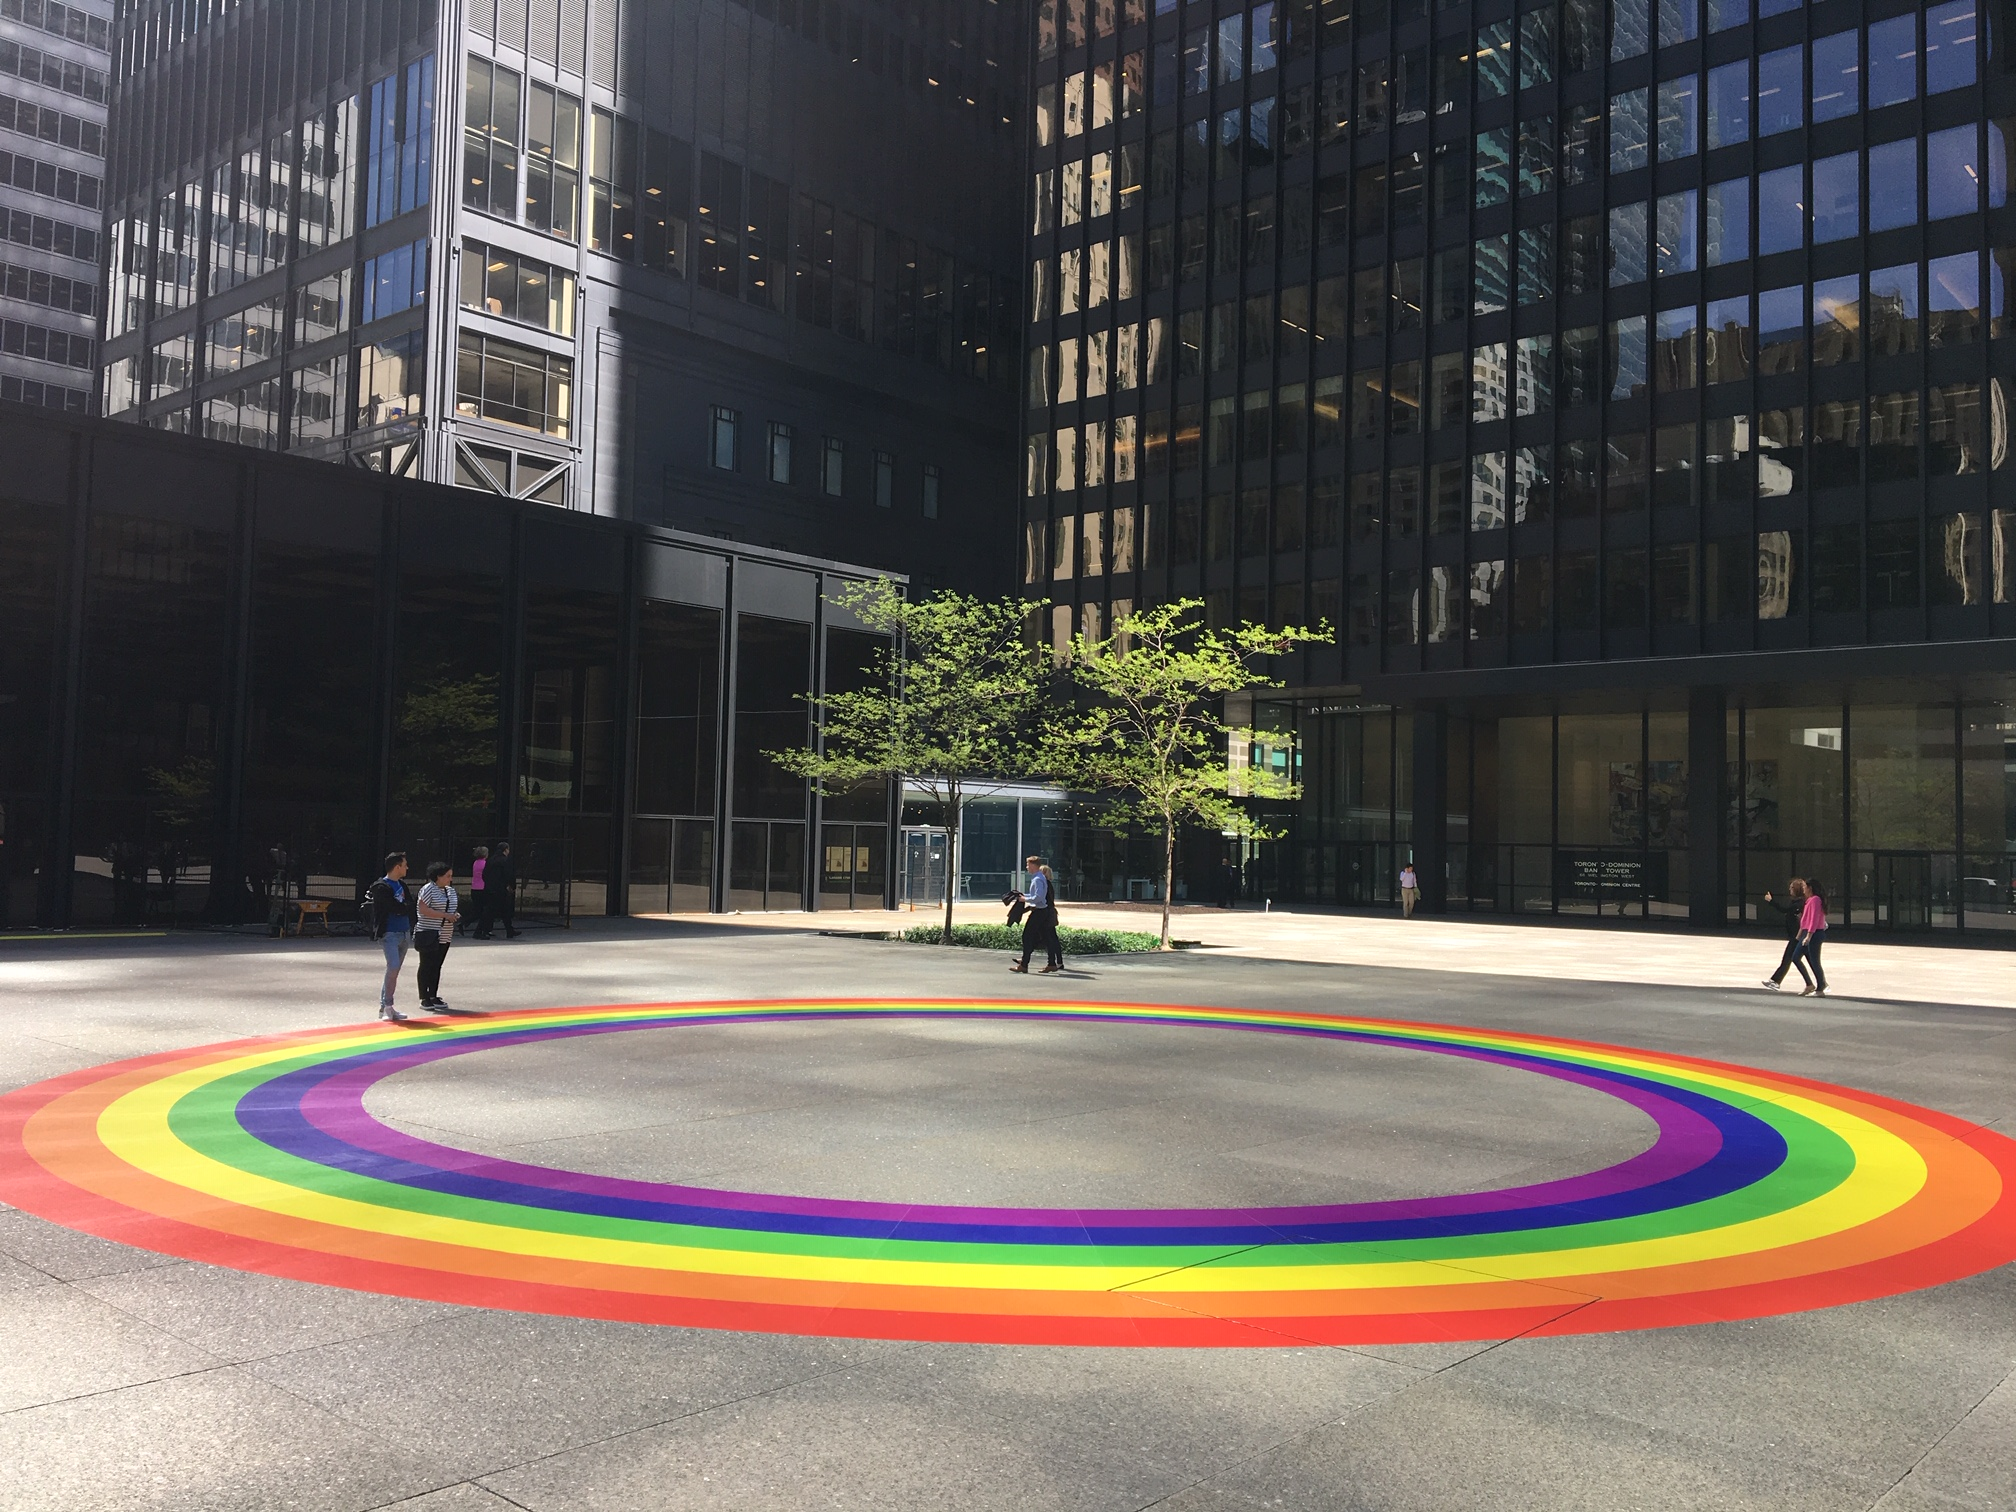 TD Bank Rainbow Circle Outdoor Floor Graphic